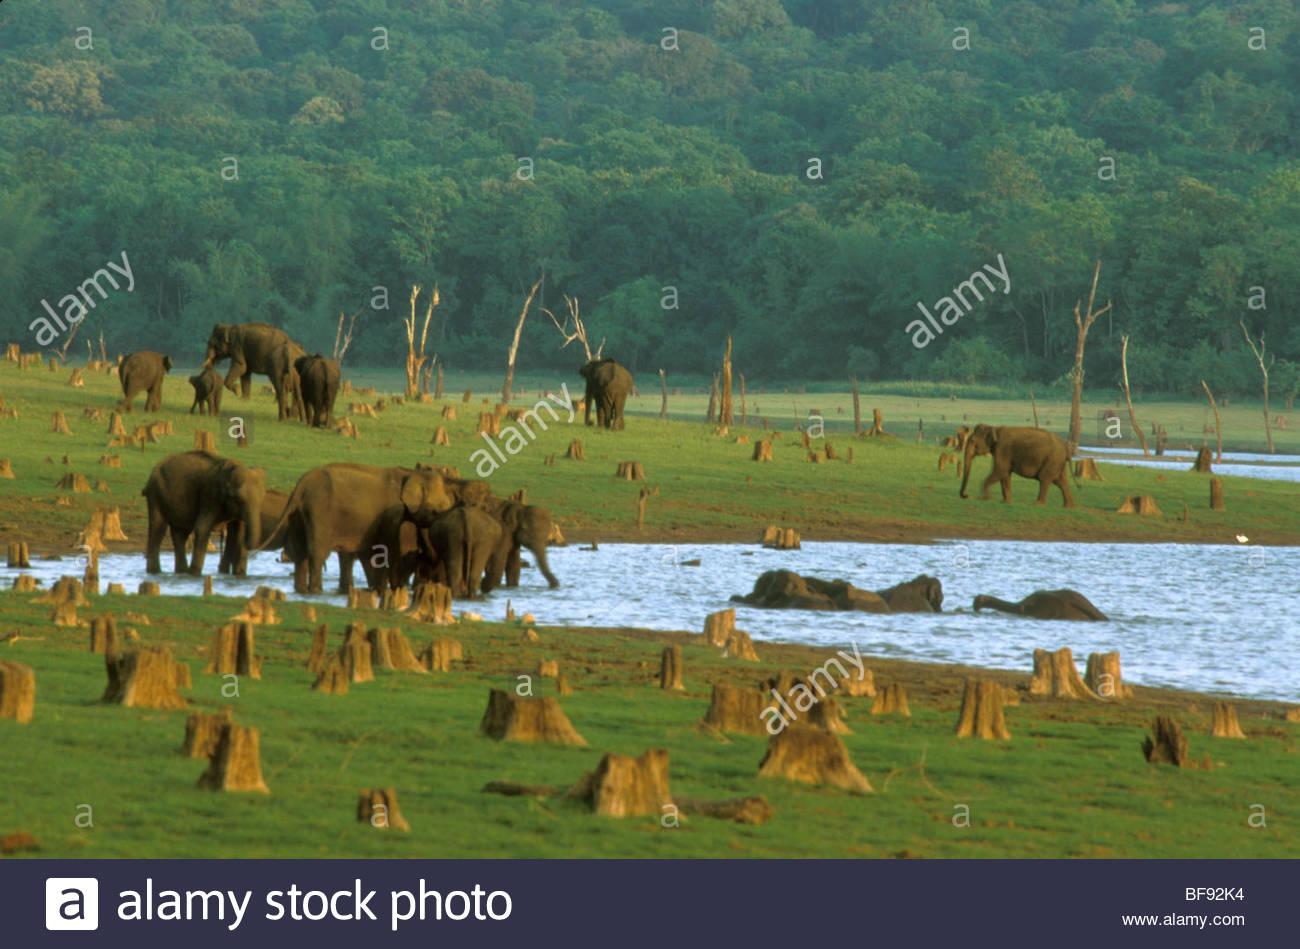 Asiatic elephants grazing on floodplain amid tree stumps, Elephas maximus, Nagarahole National Park, Western Ghats, - Stock Image